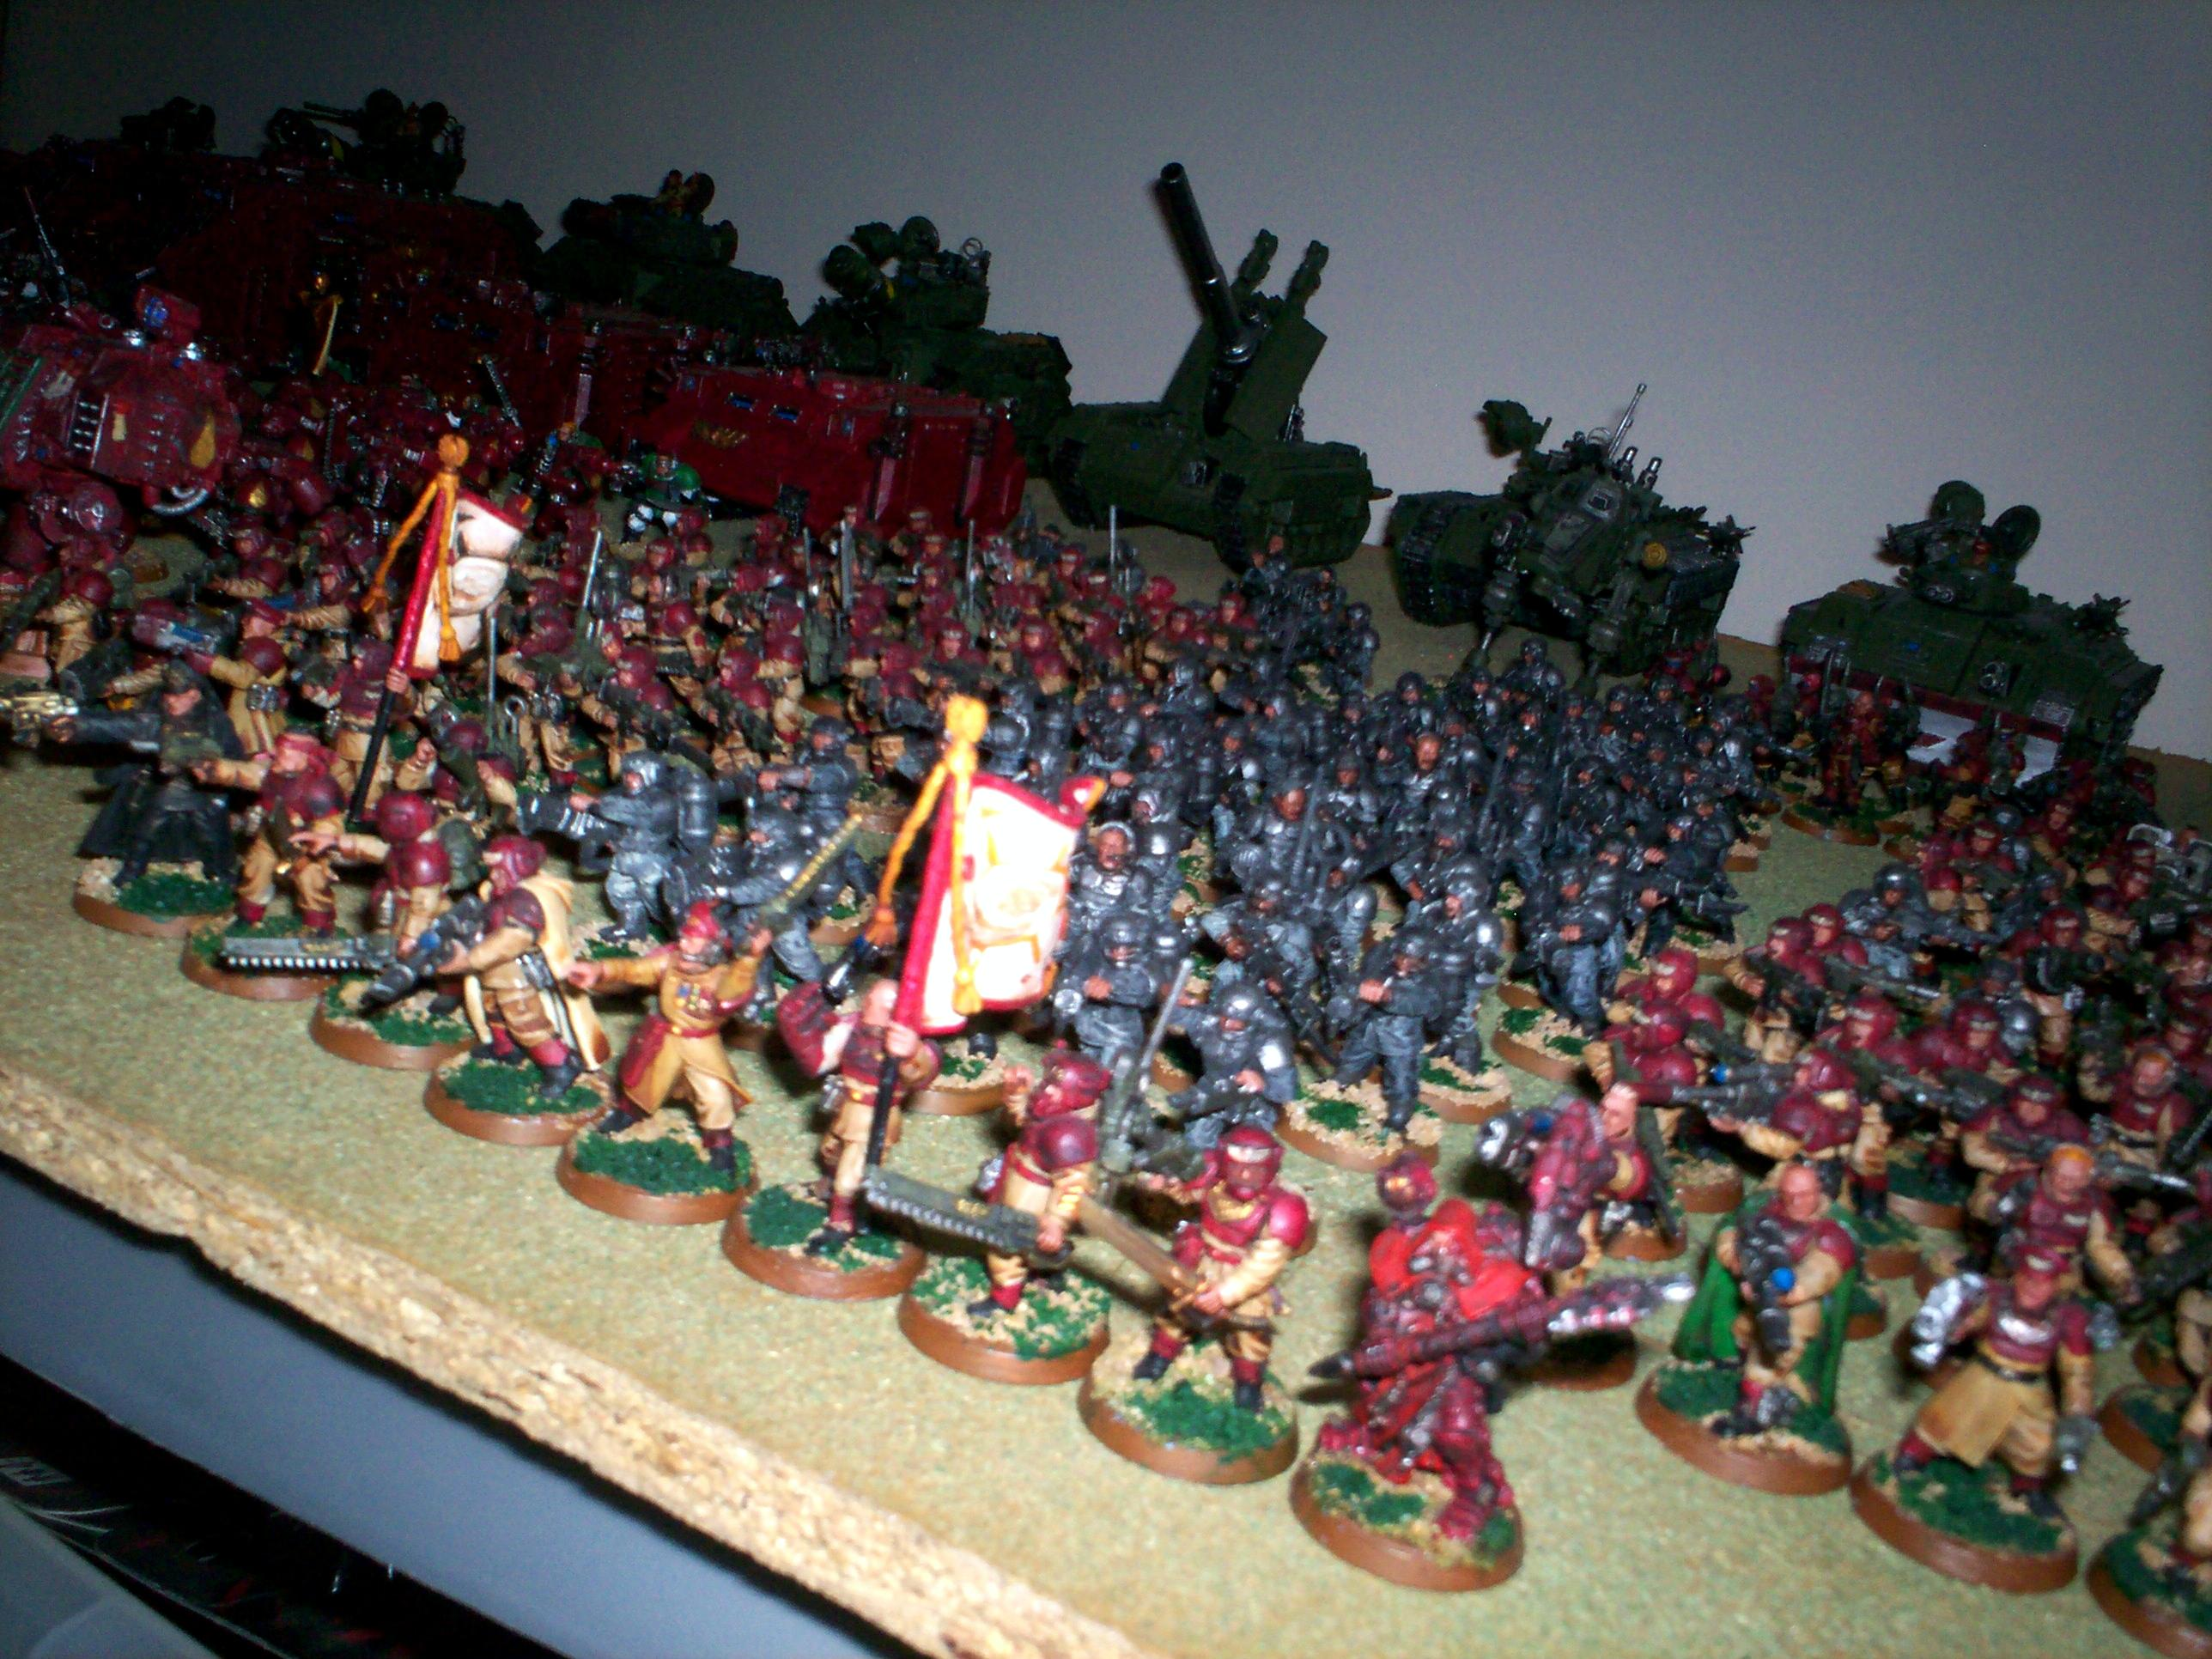 Armys, Warhammer 40,000